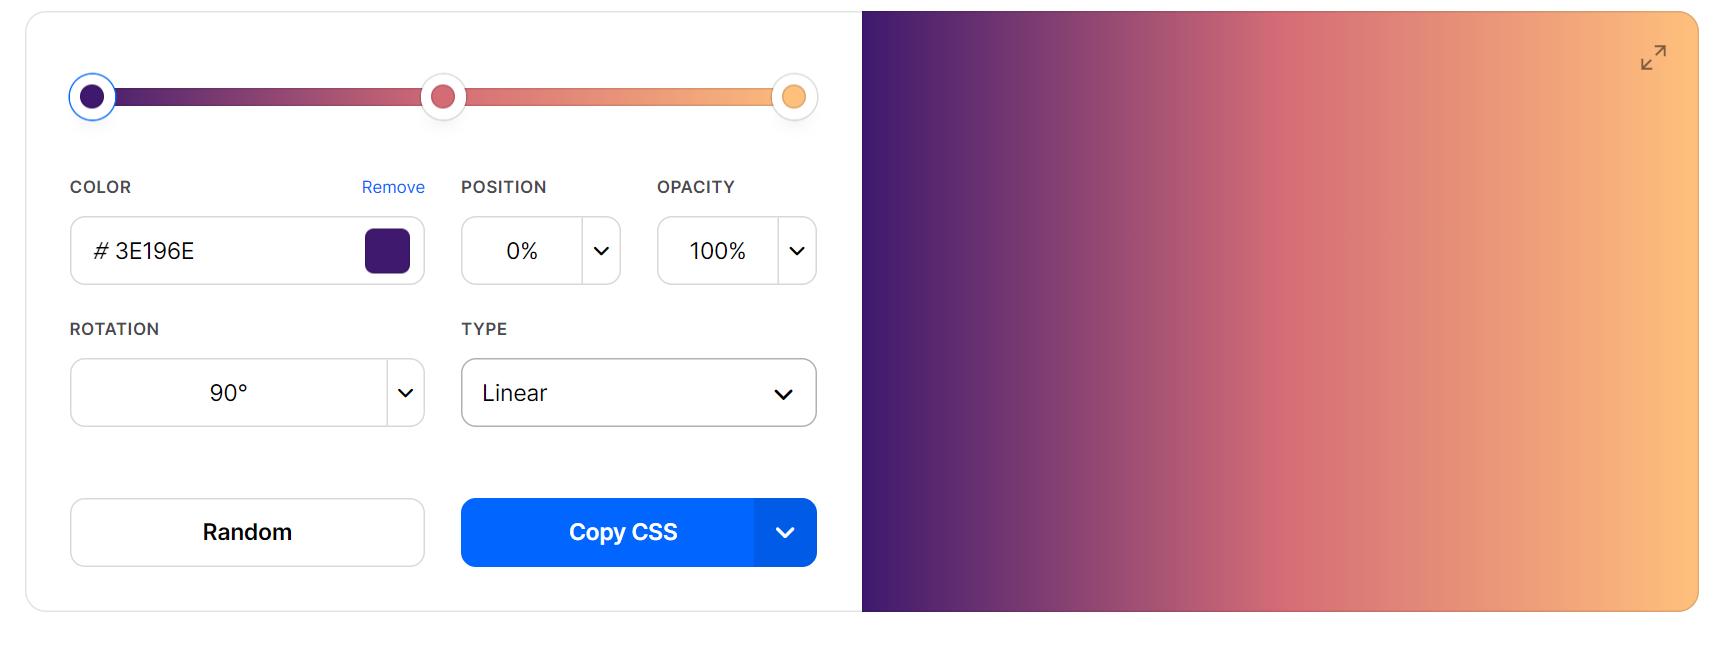 Coolors dedicated gradient tool